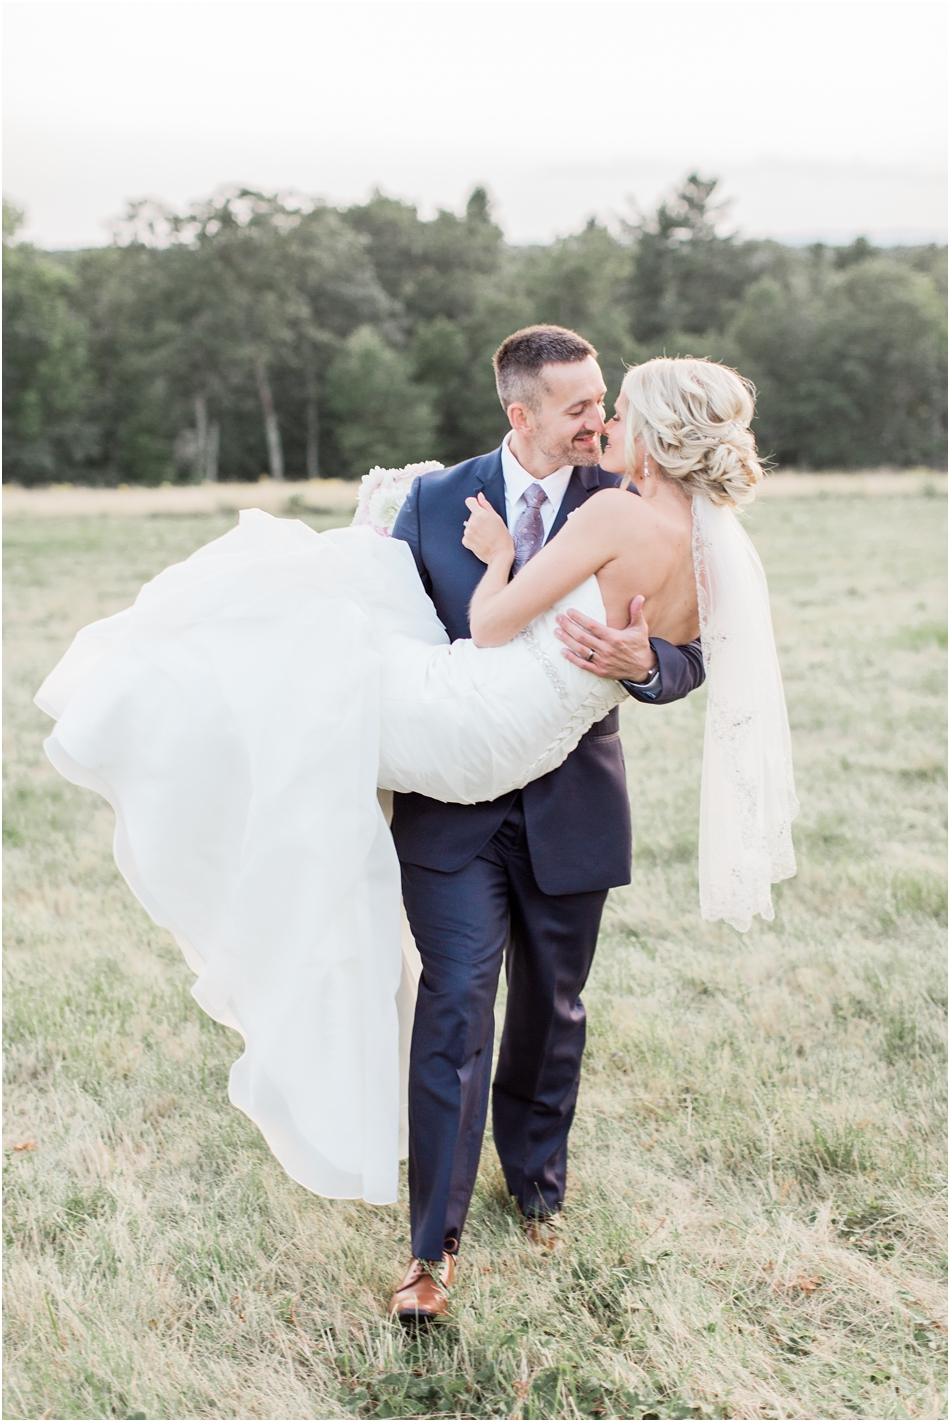 harrington_farm_leominster_sandra_jack_cape_cod_boston_new_england_wedding_photographer_Meredith_Jane_Photography_photo_2304.jpg